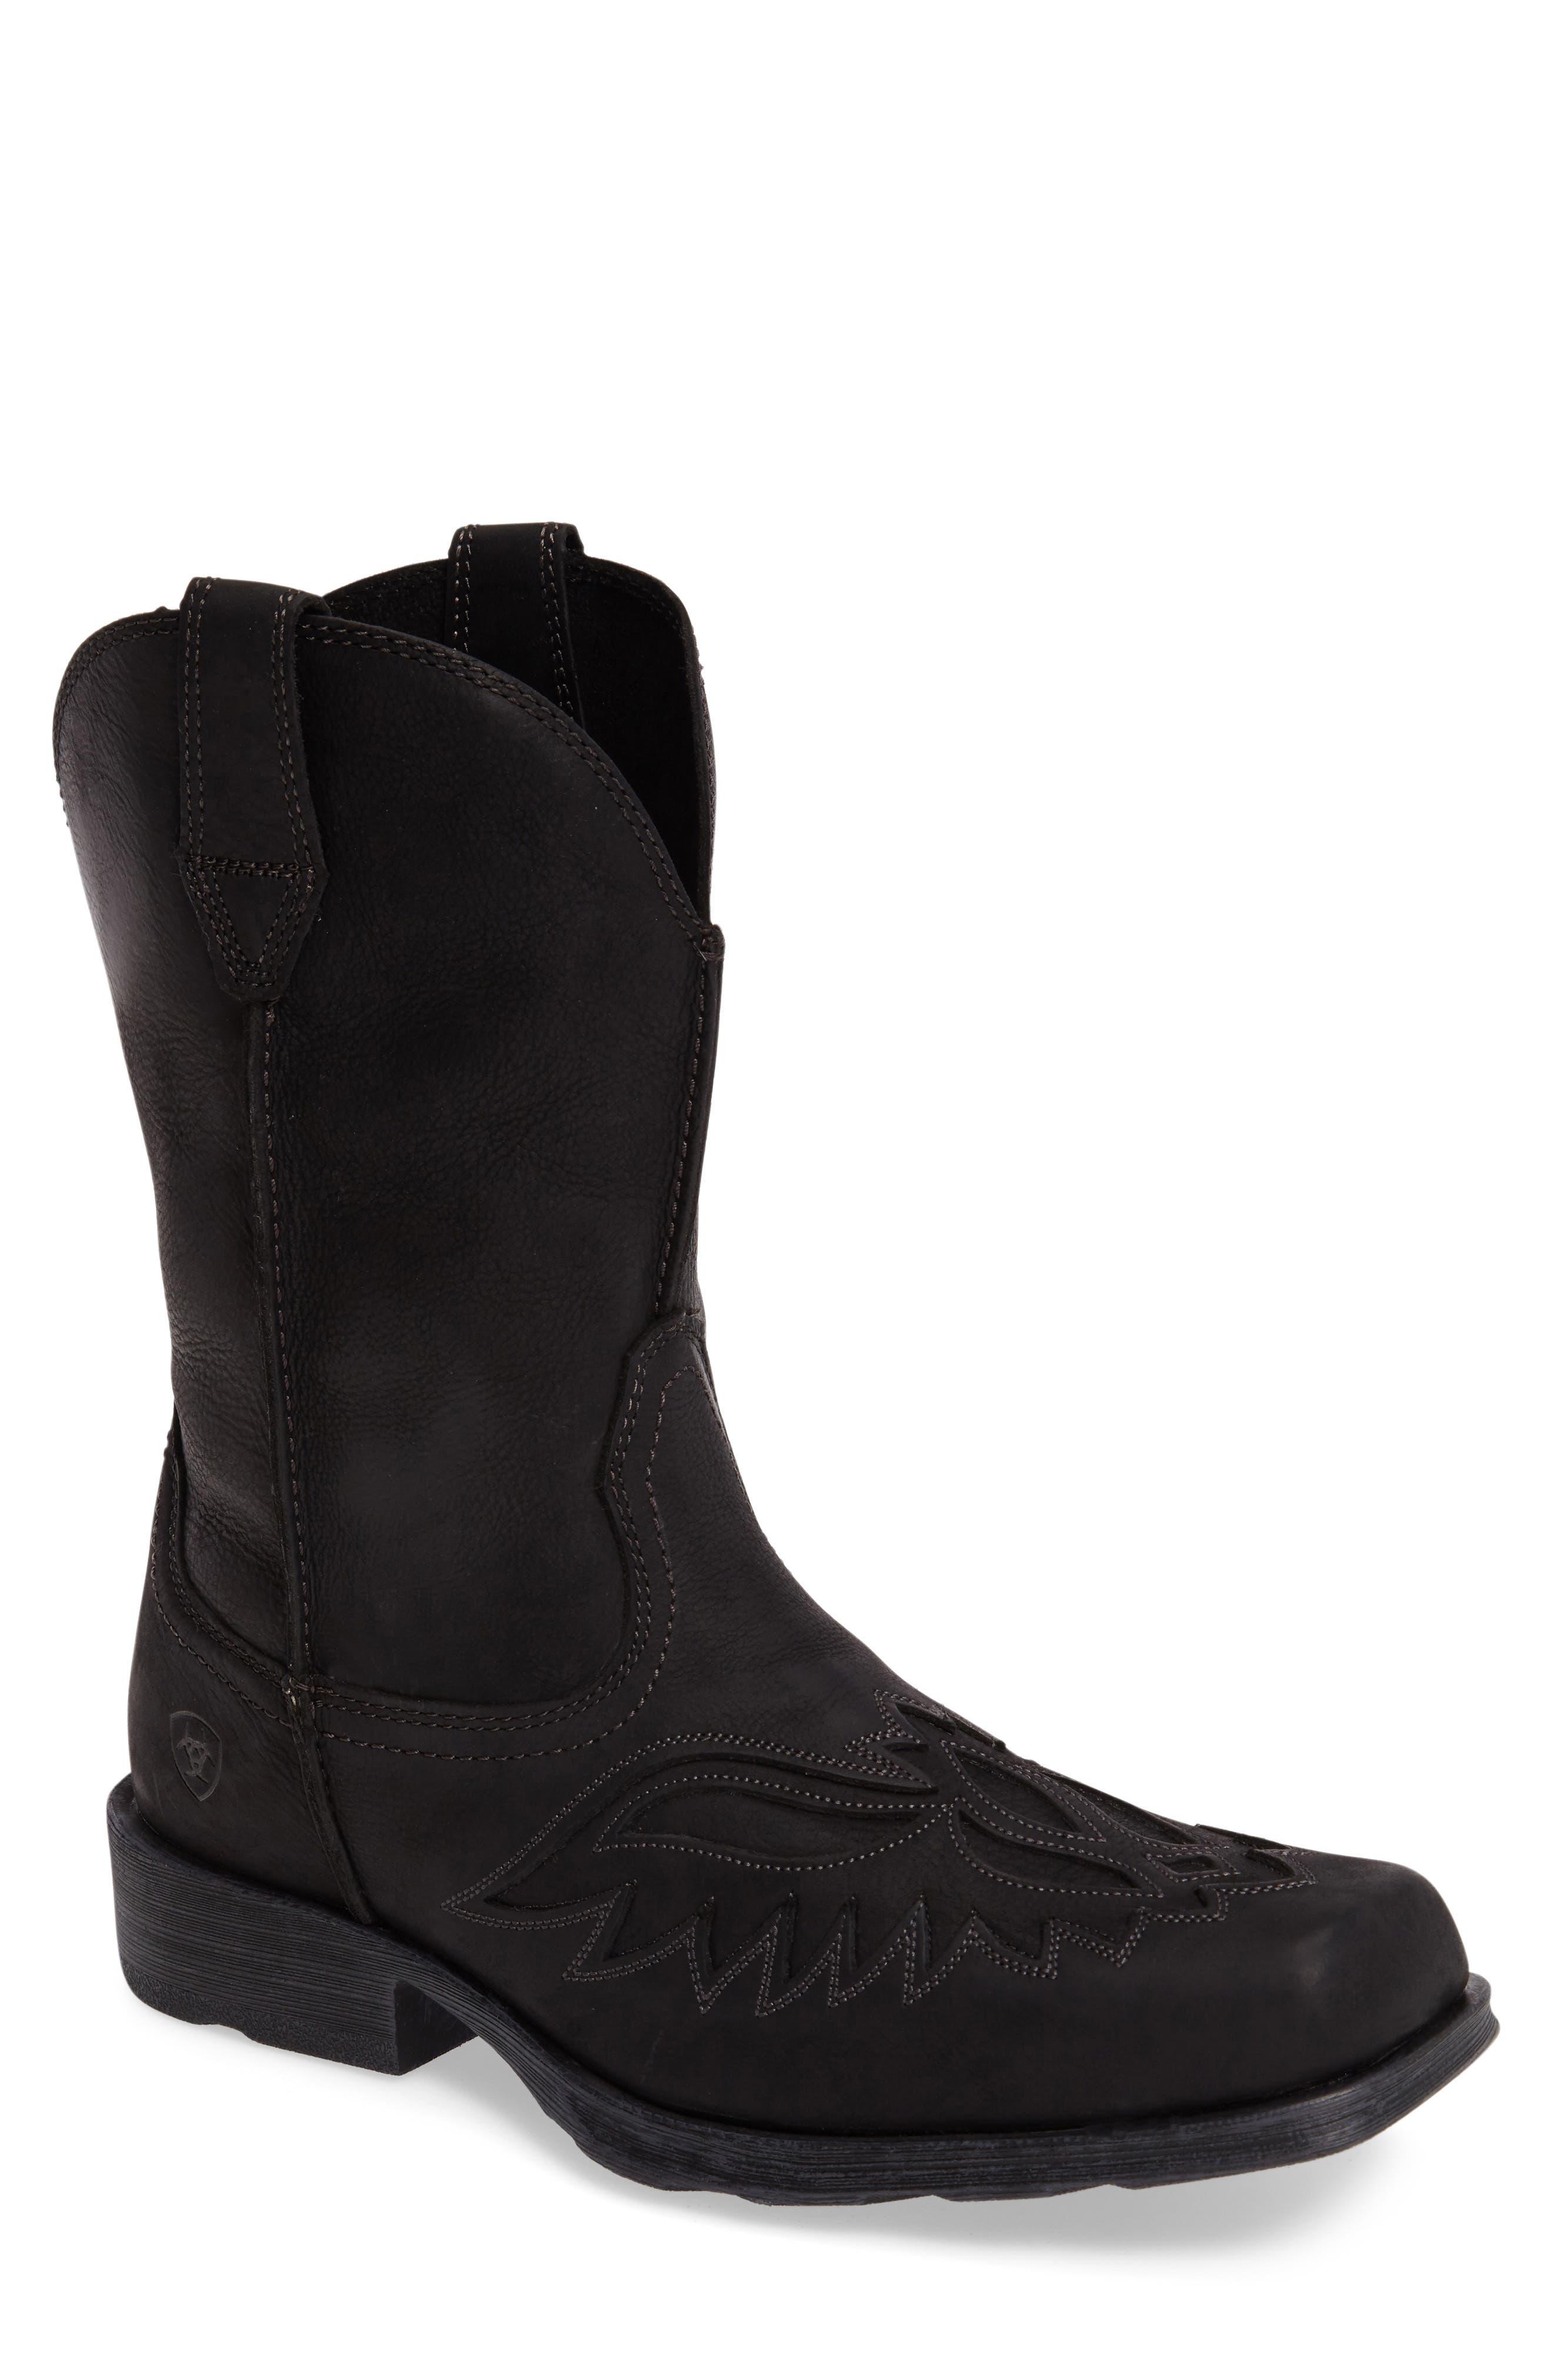 ARIAT Rambler Renegade Cowboy Boot, Main, color, 001